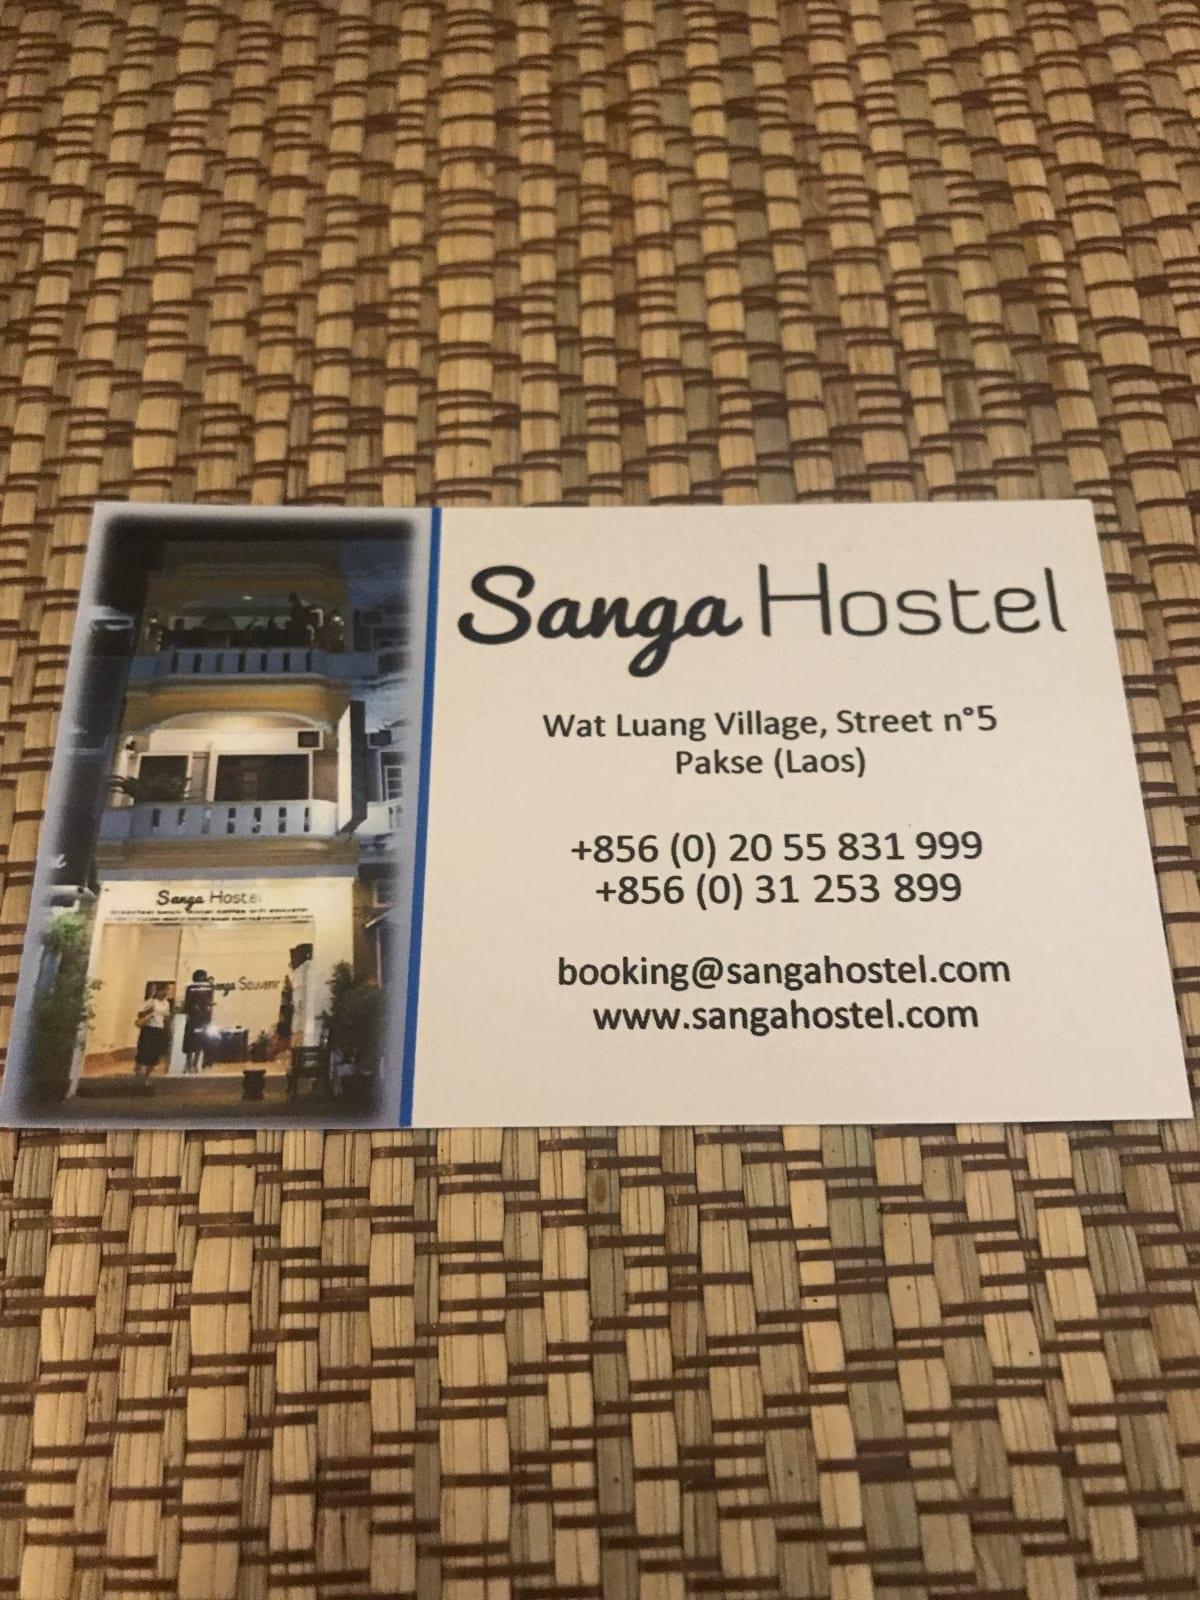 Sanga Hostel, Pakse, Laos